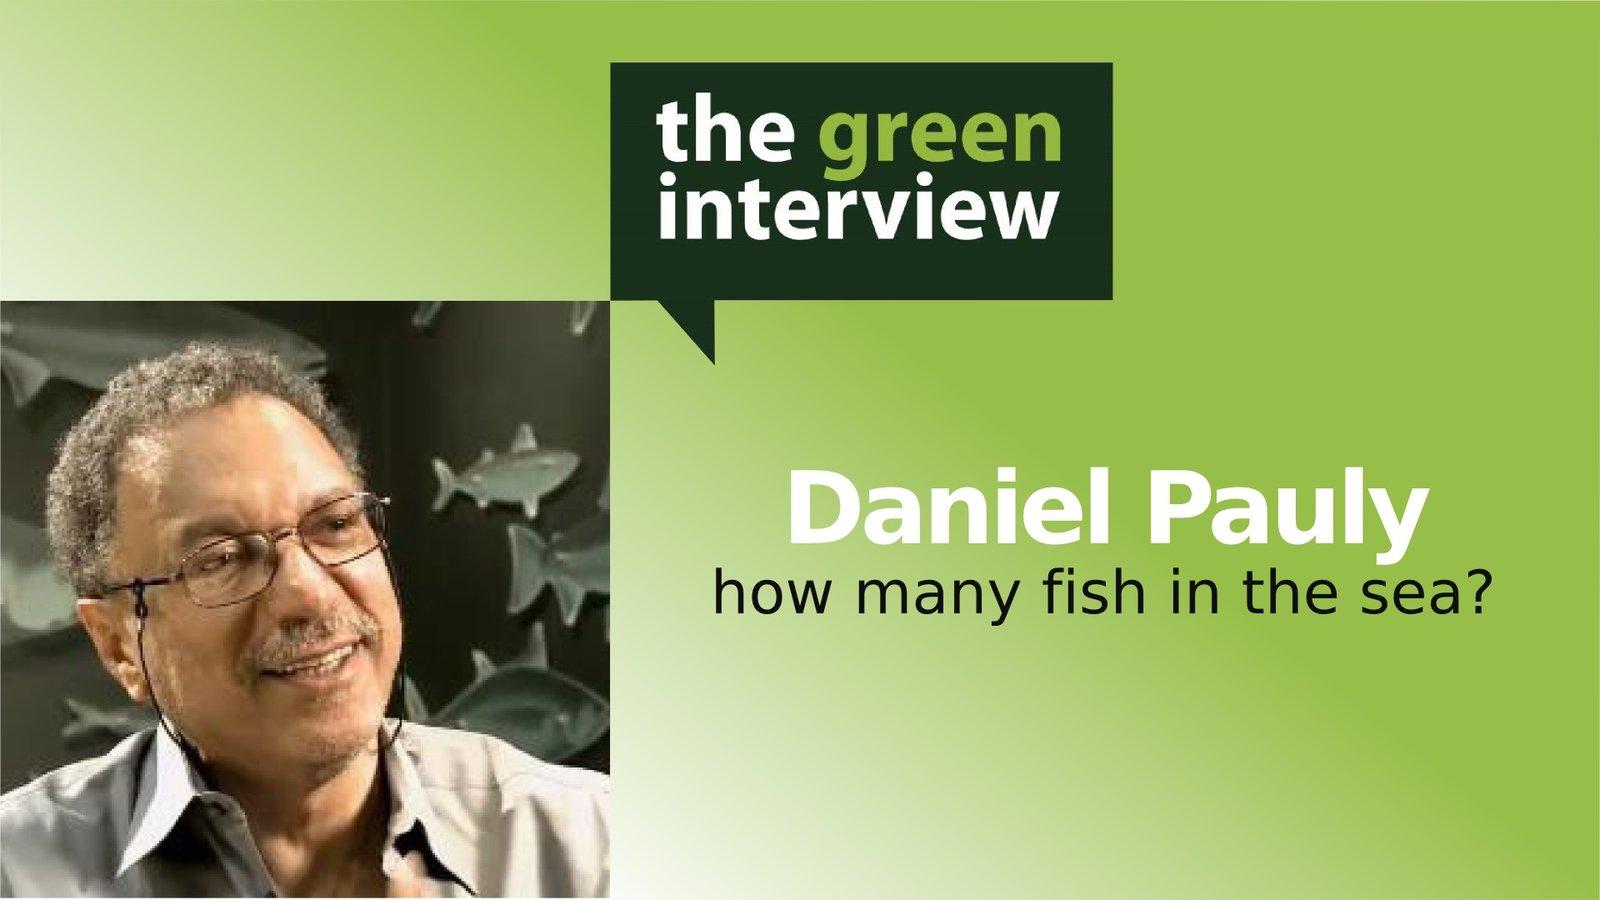 Daniel Pauly: How Many Fish in the Sea?